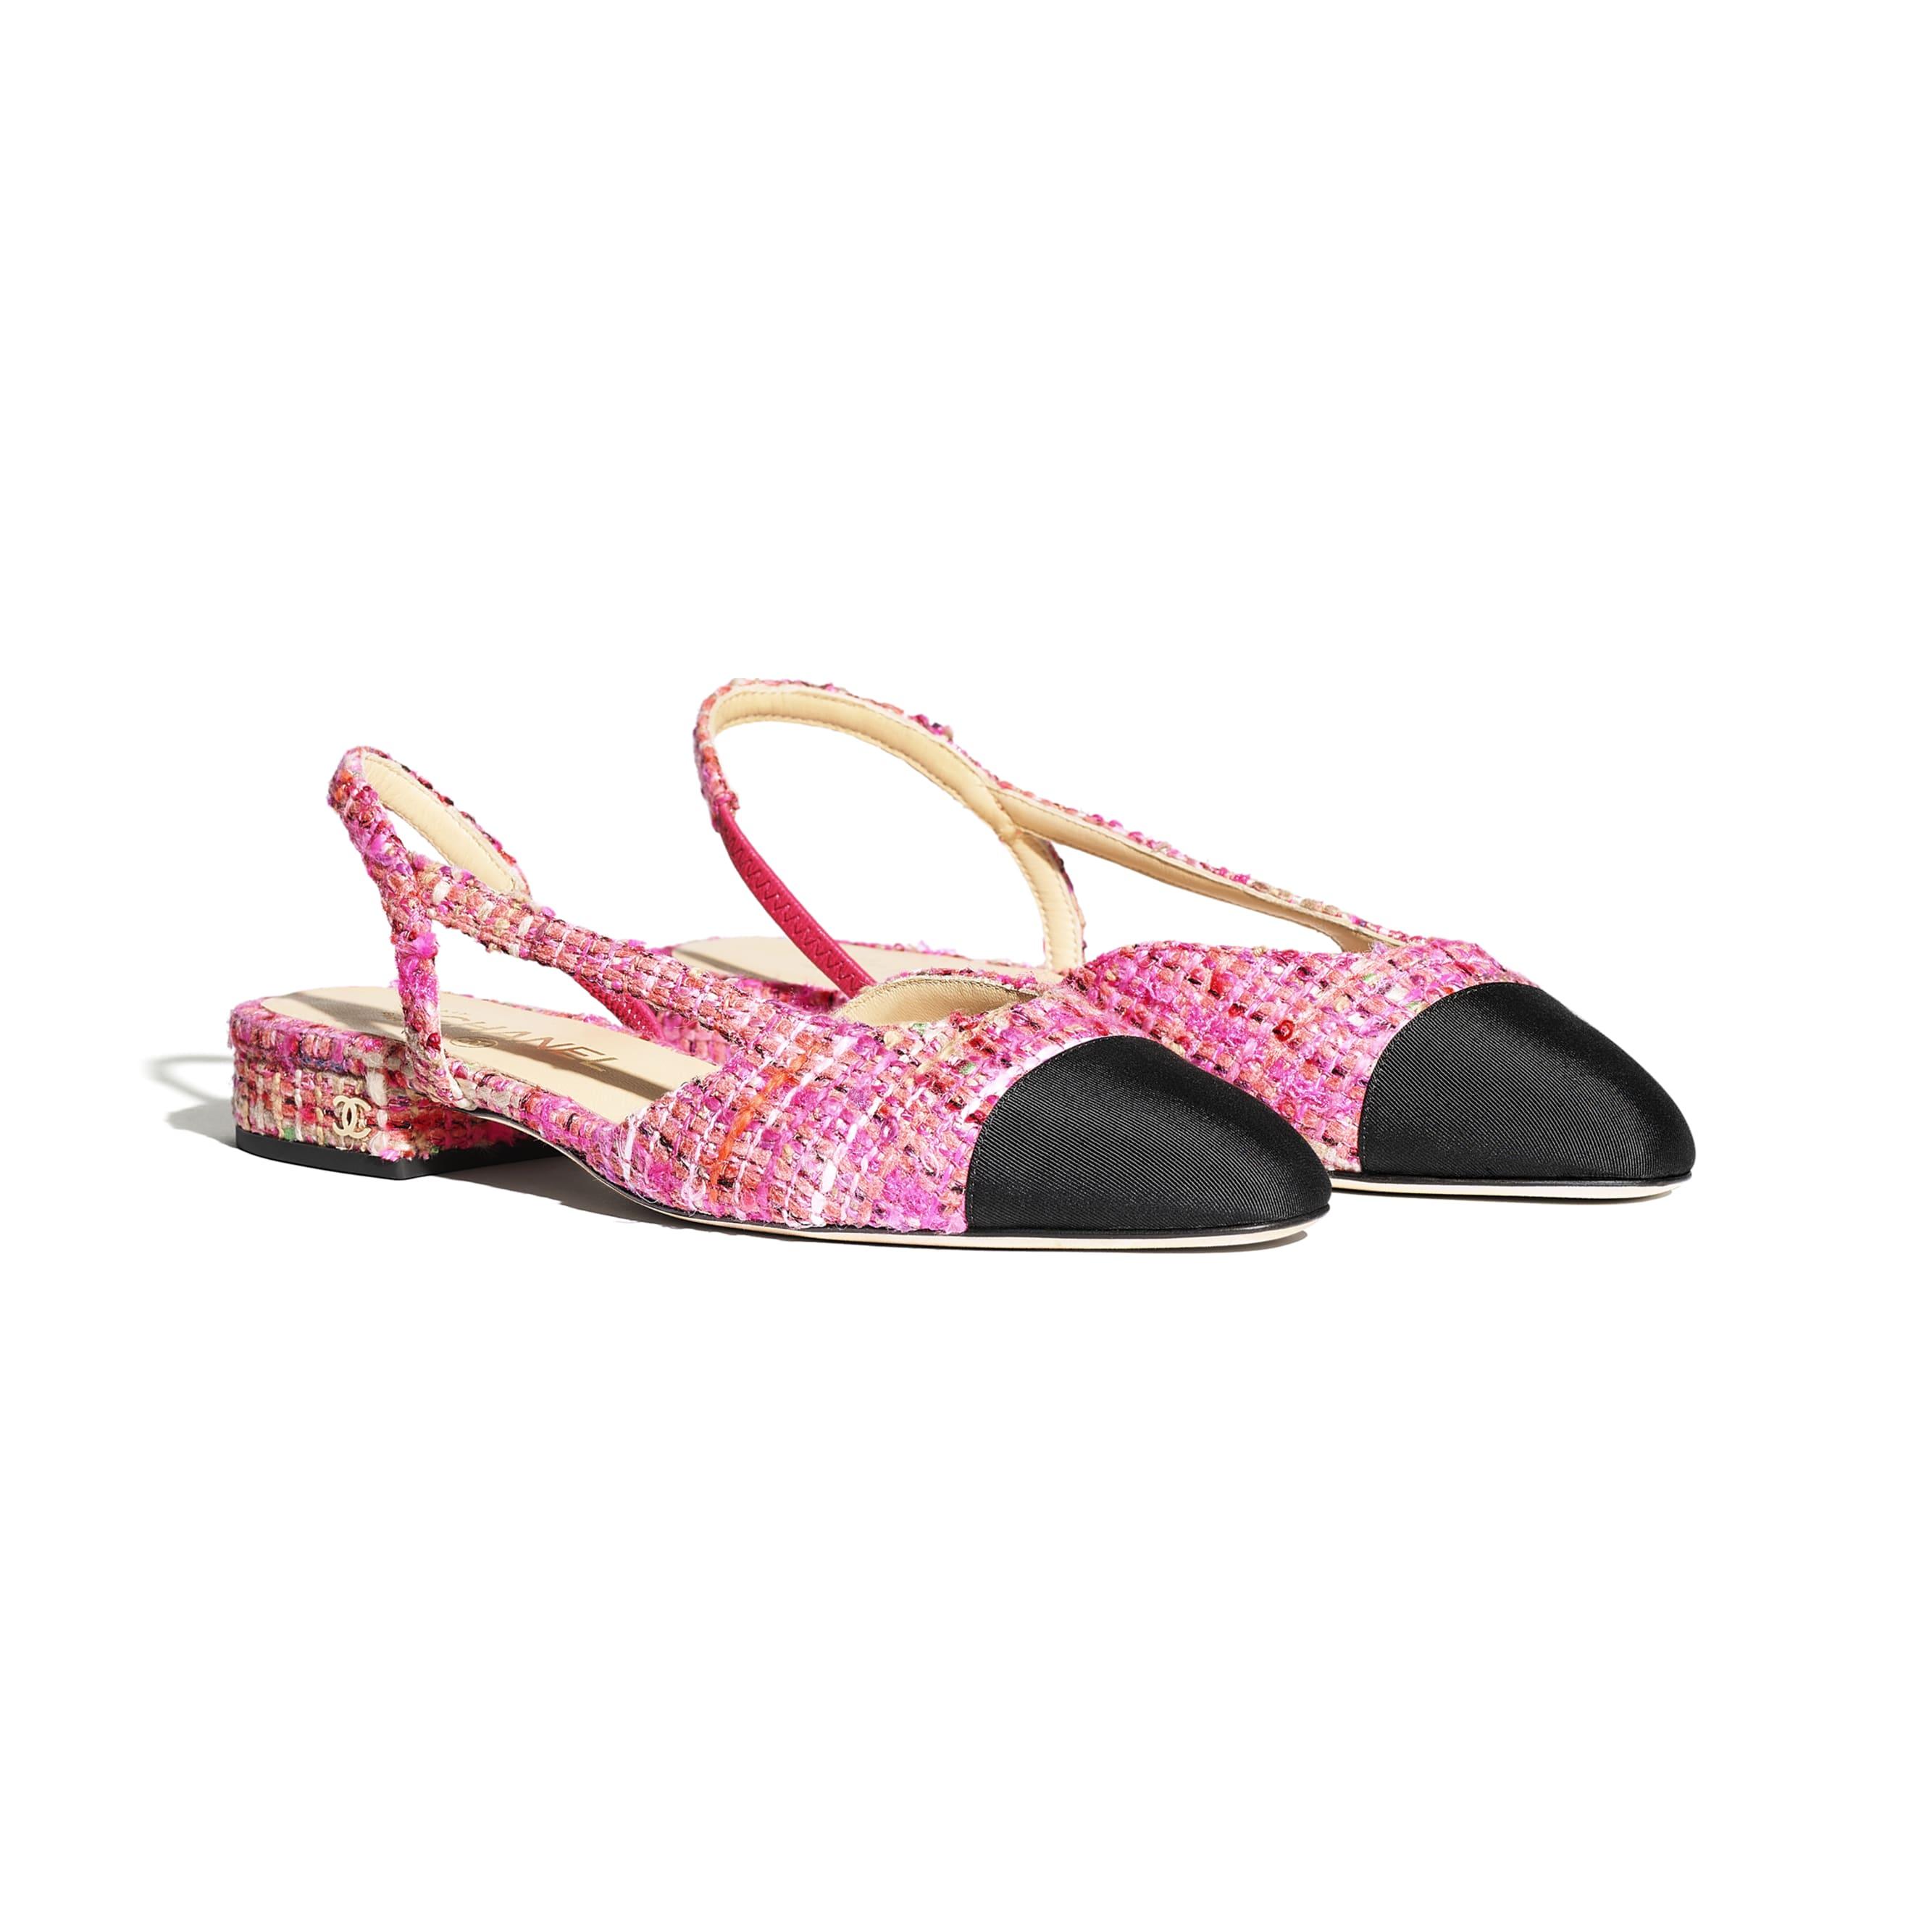 Sling-Back - Pink, Light Pink & Black - Tweed & Grosgrain - CHANEL - Alternative view - see standard sized version